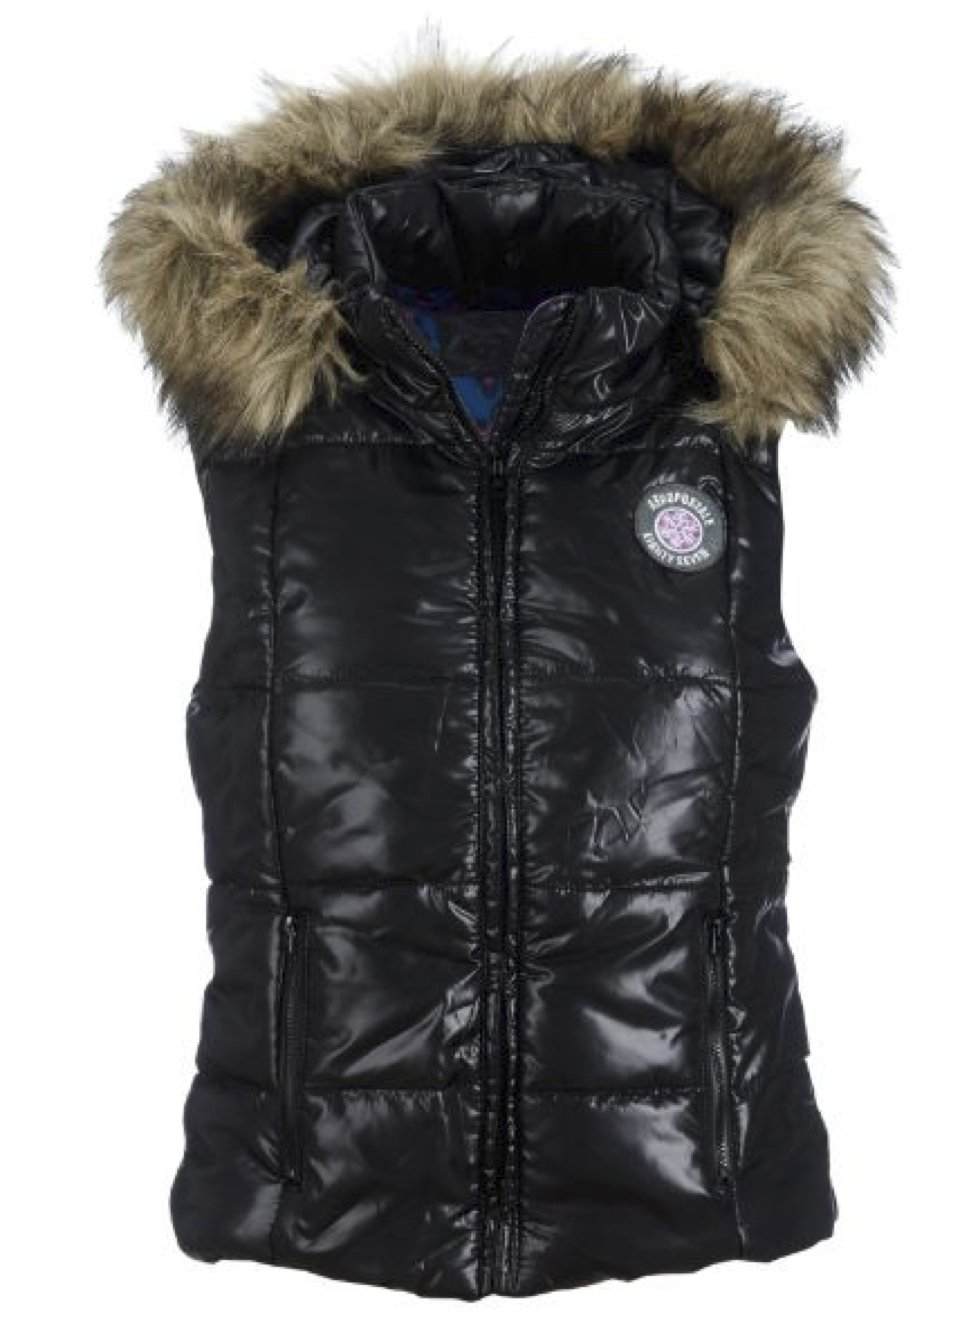 Aeropostale Womens Detachable Hooded Puffer Vest 001 S